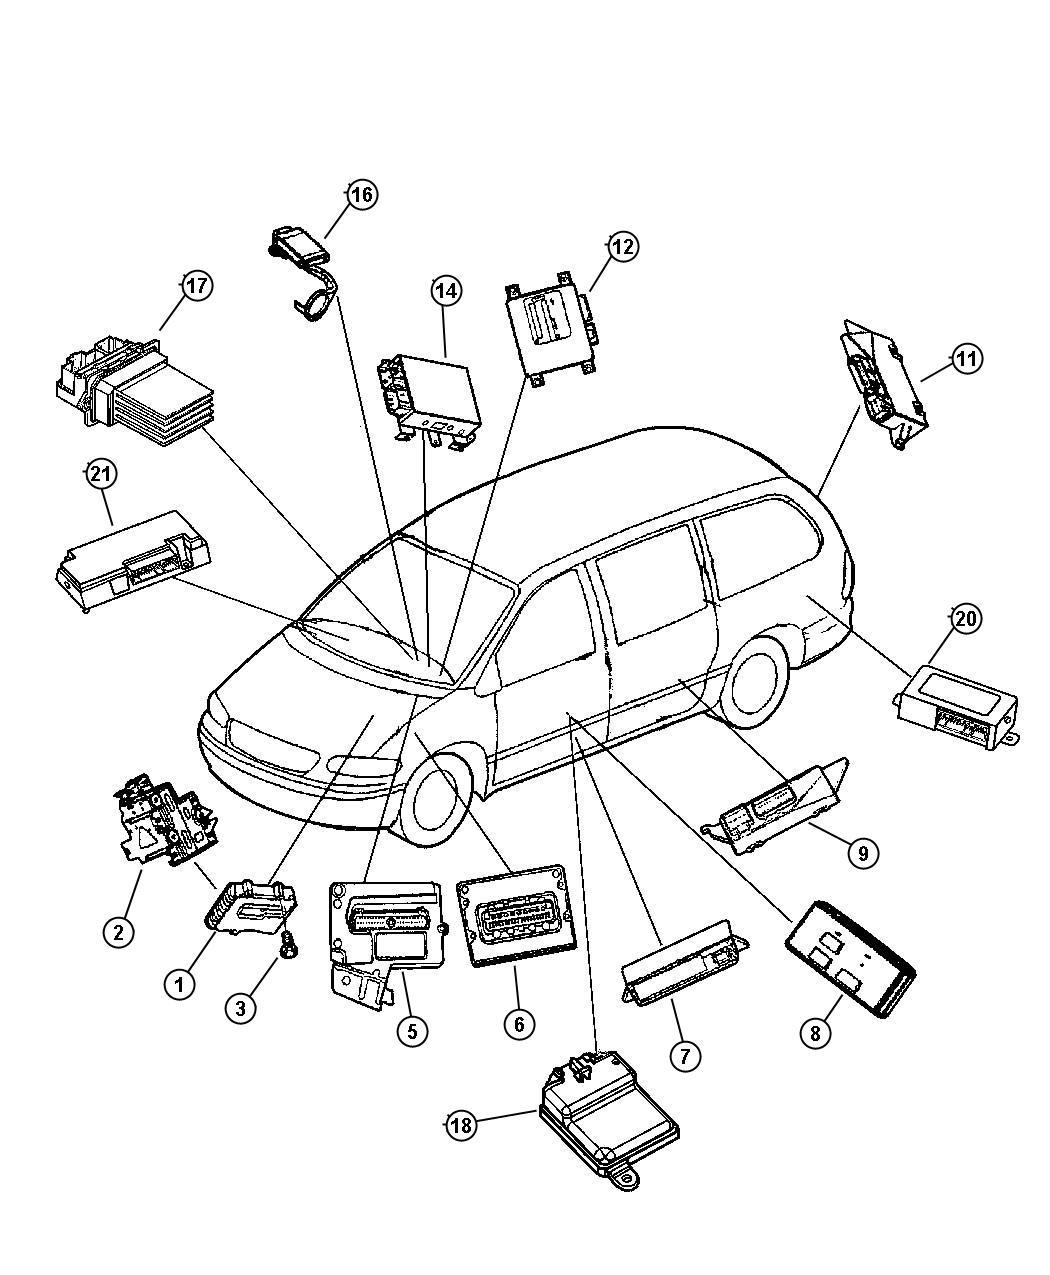 hight resolution of wrg 5531 2005 dodge caravan fuse box diagram 2001 dodge caravan parts diagram